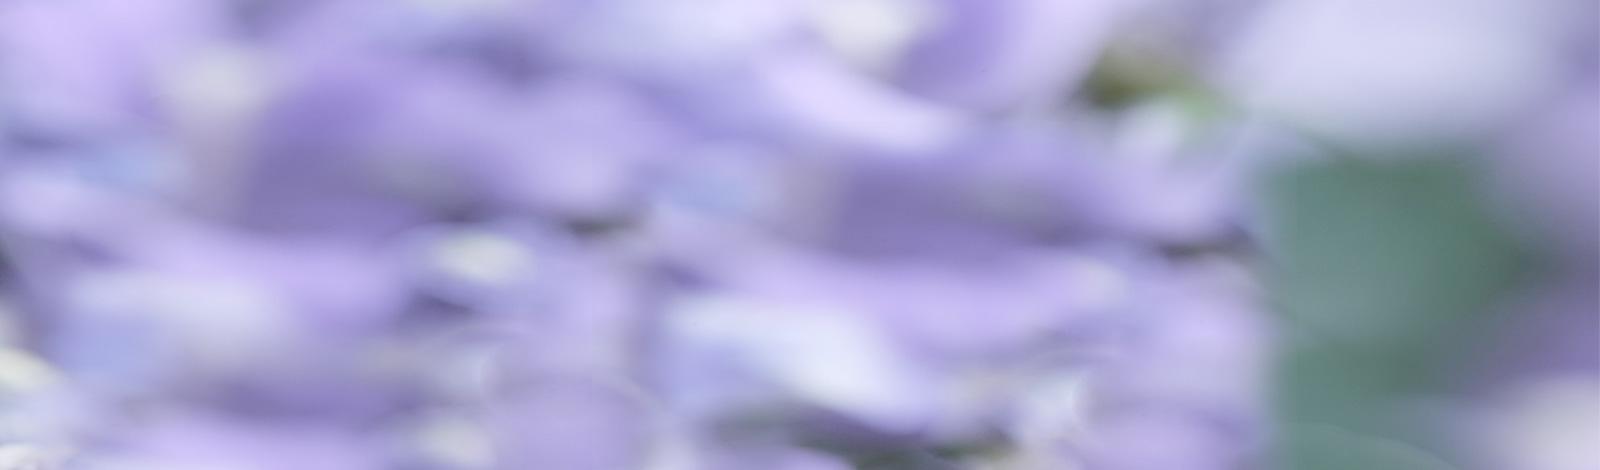 mauve-background